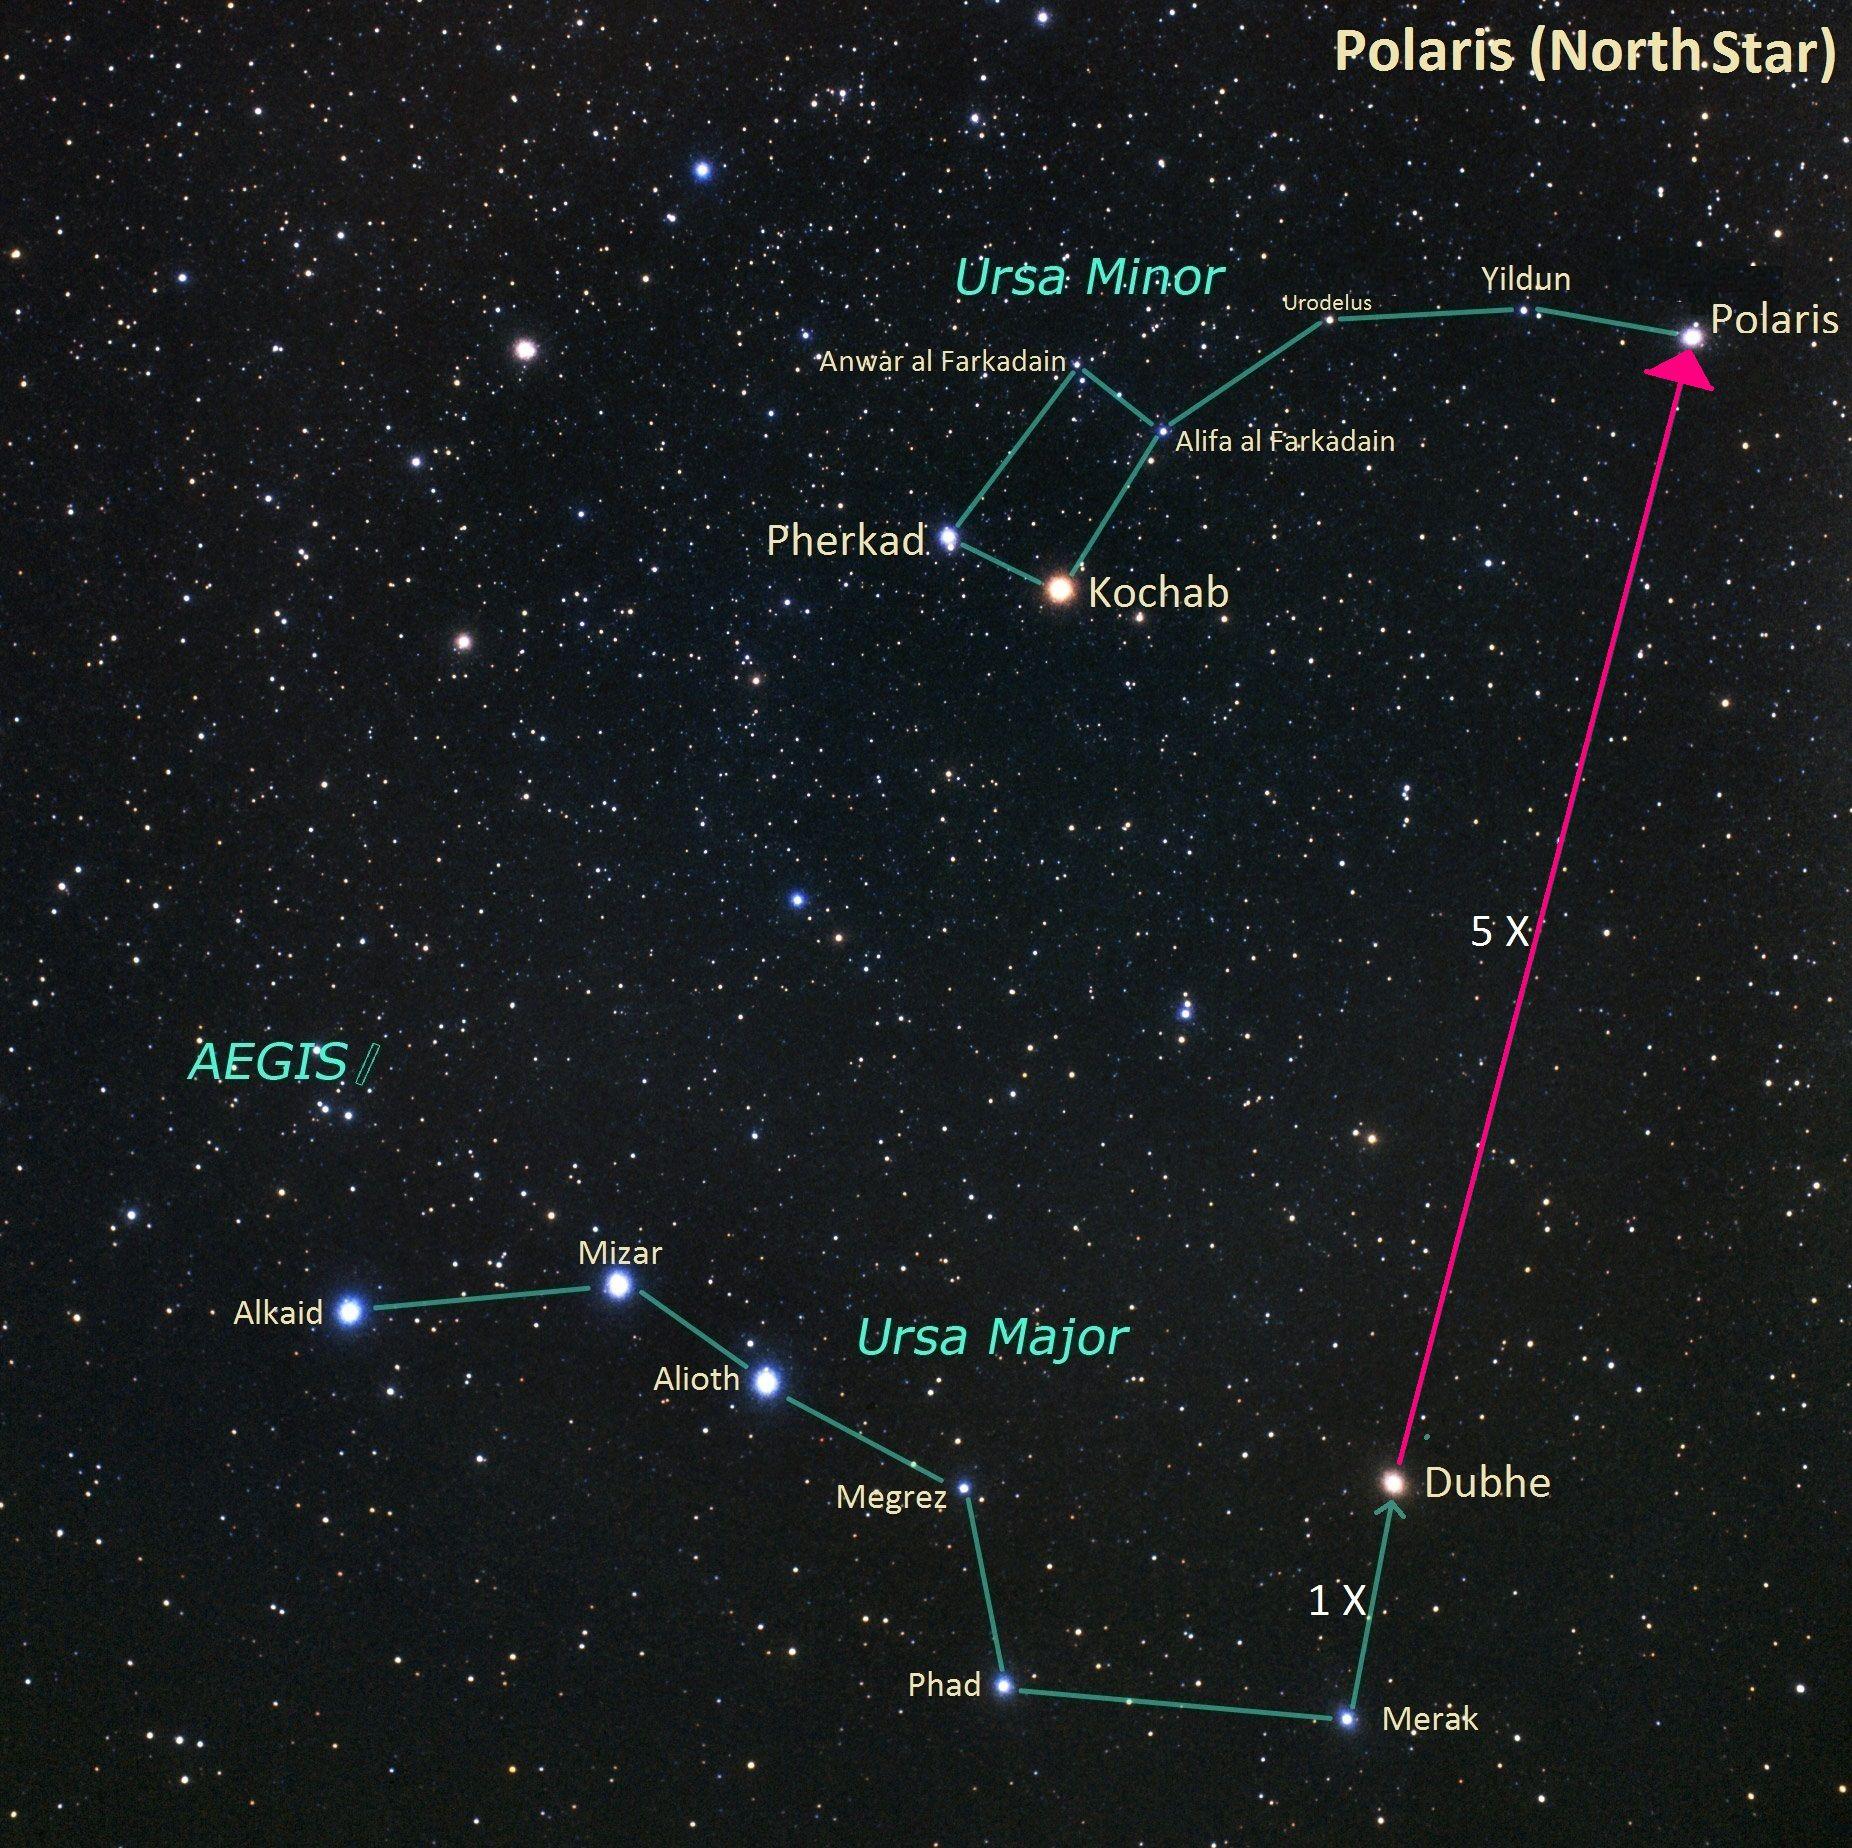 Polaris - brightest star in the constellation Ursa Minor ...